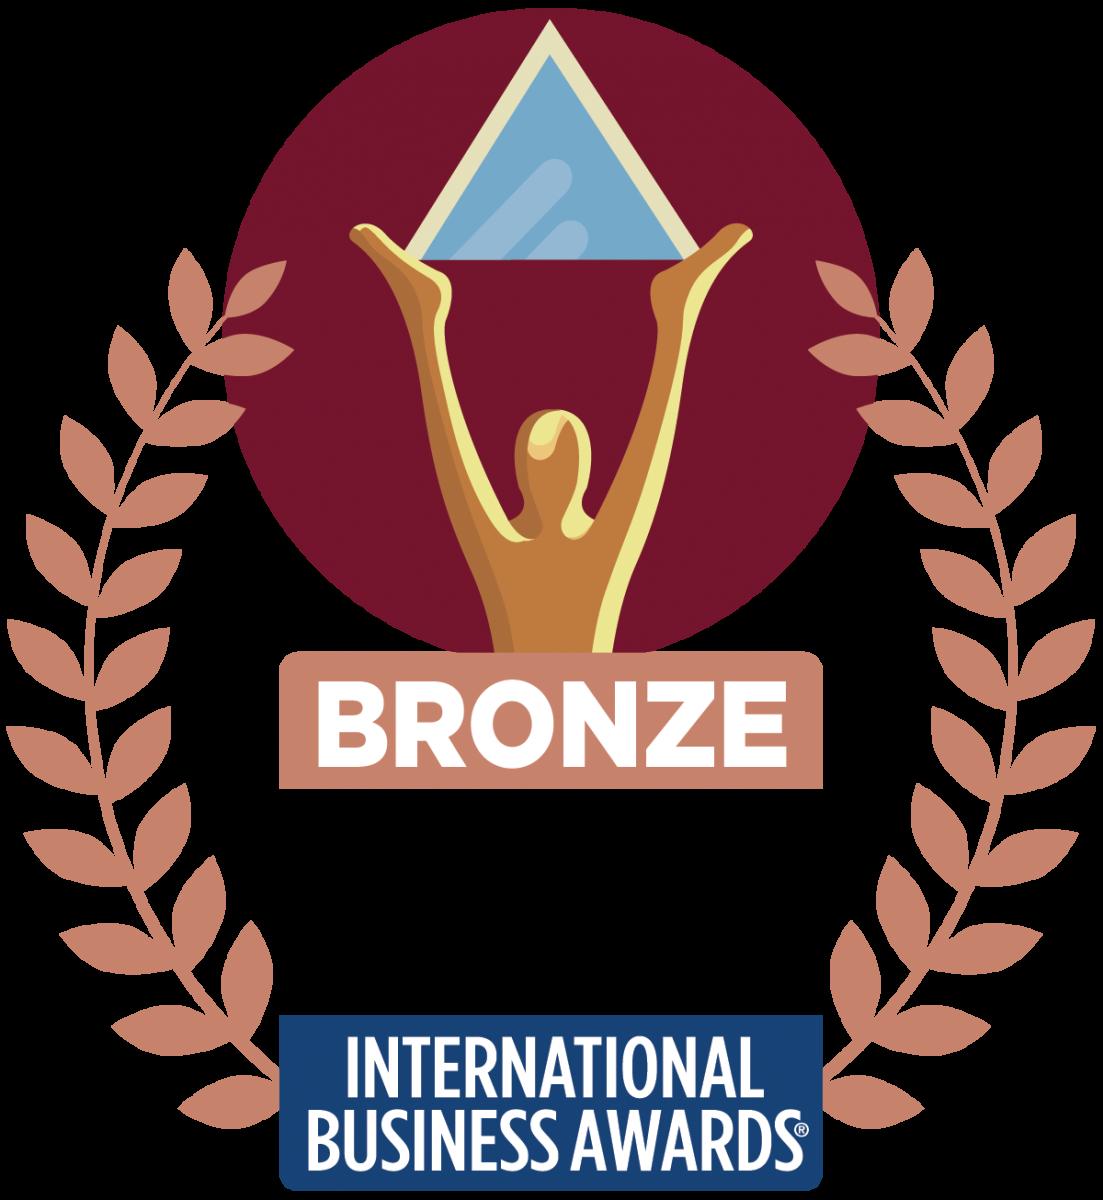 IBA20 bronze winner redbg - Meralco wins 2020 International Business Award